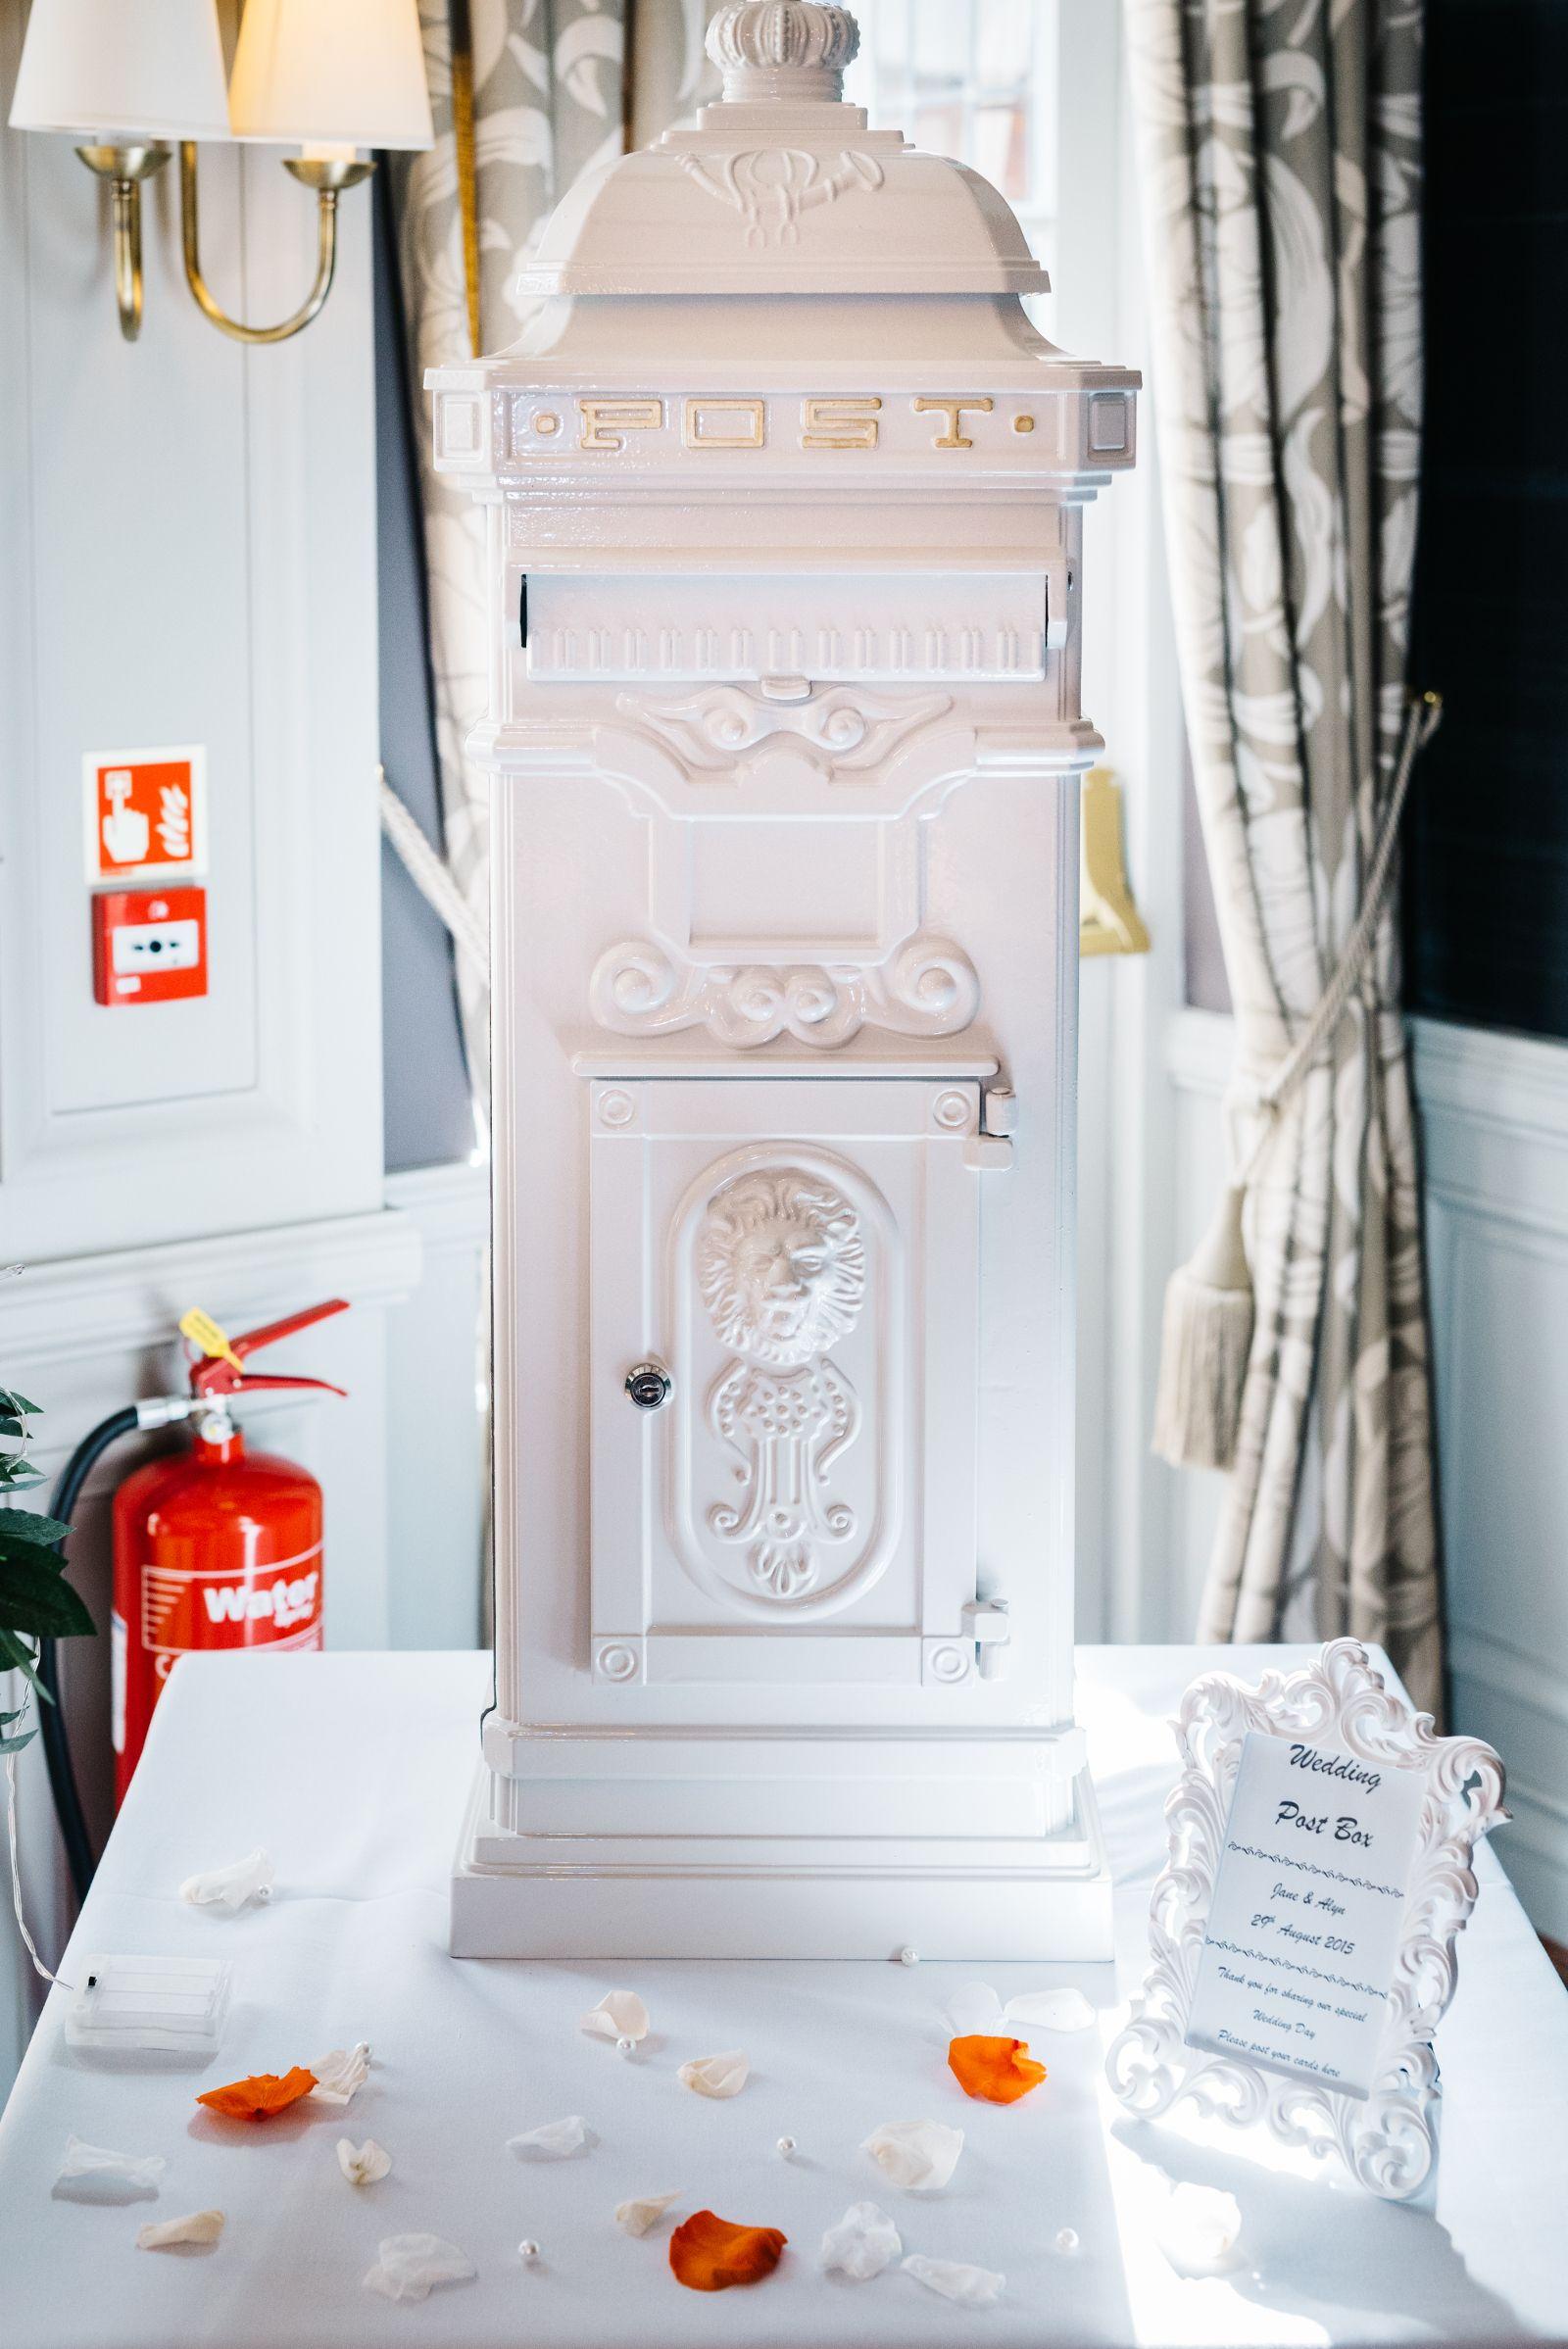 The Wedding Cabinet - Hire Vintage Victorian Whirte Lockable Post Box